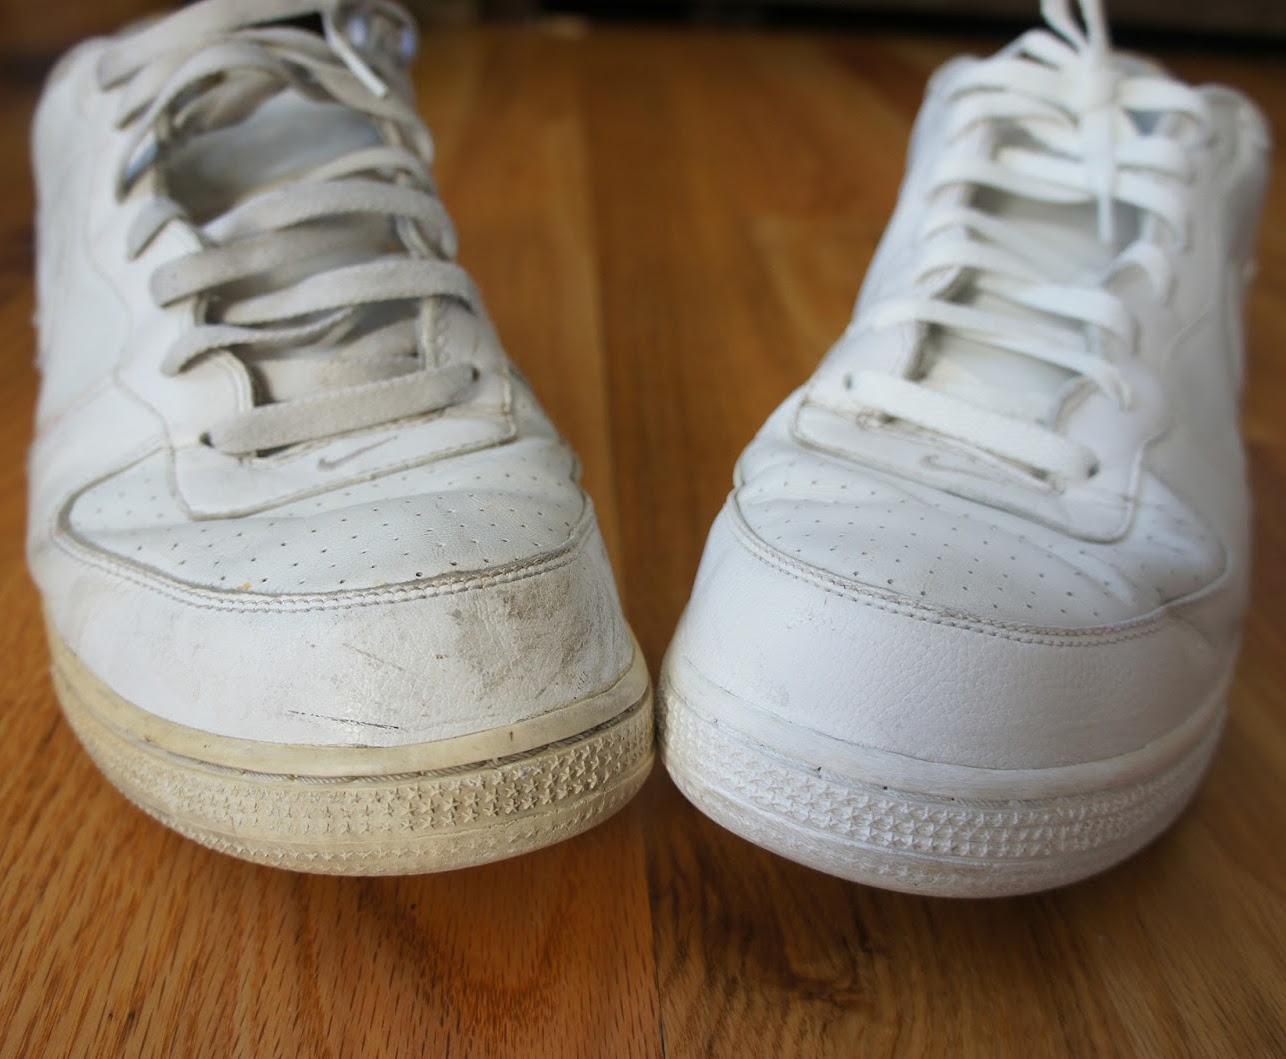 Diy comment vraiment nettoyer des baskets tradono blog ch - Nettoyer basket blanche bicarbonate ...